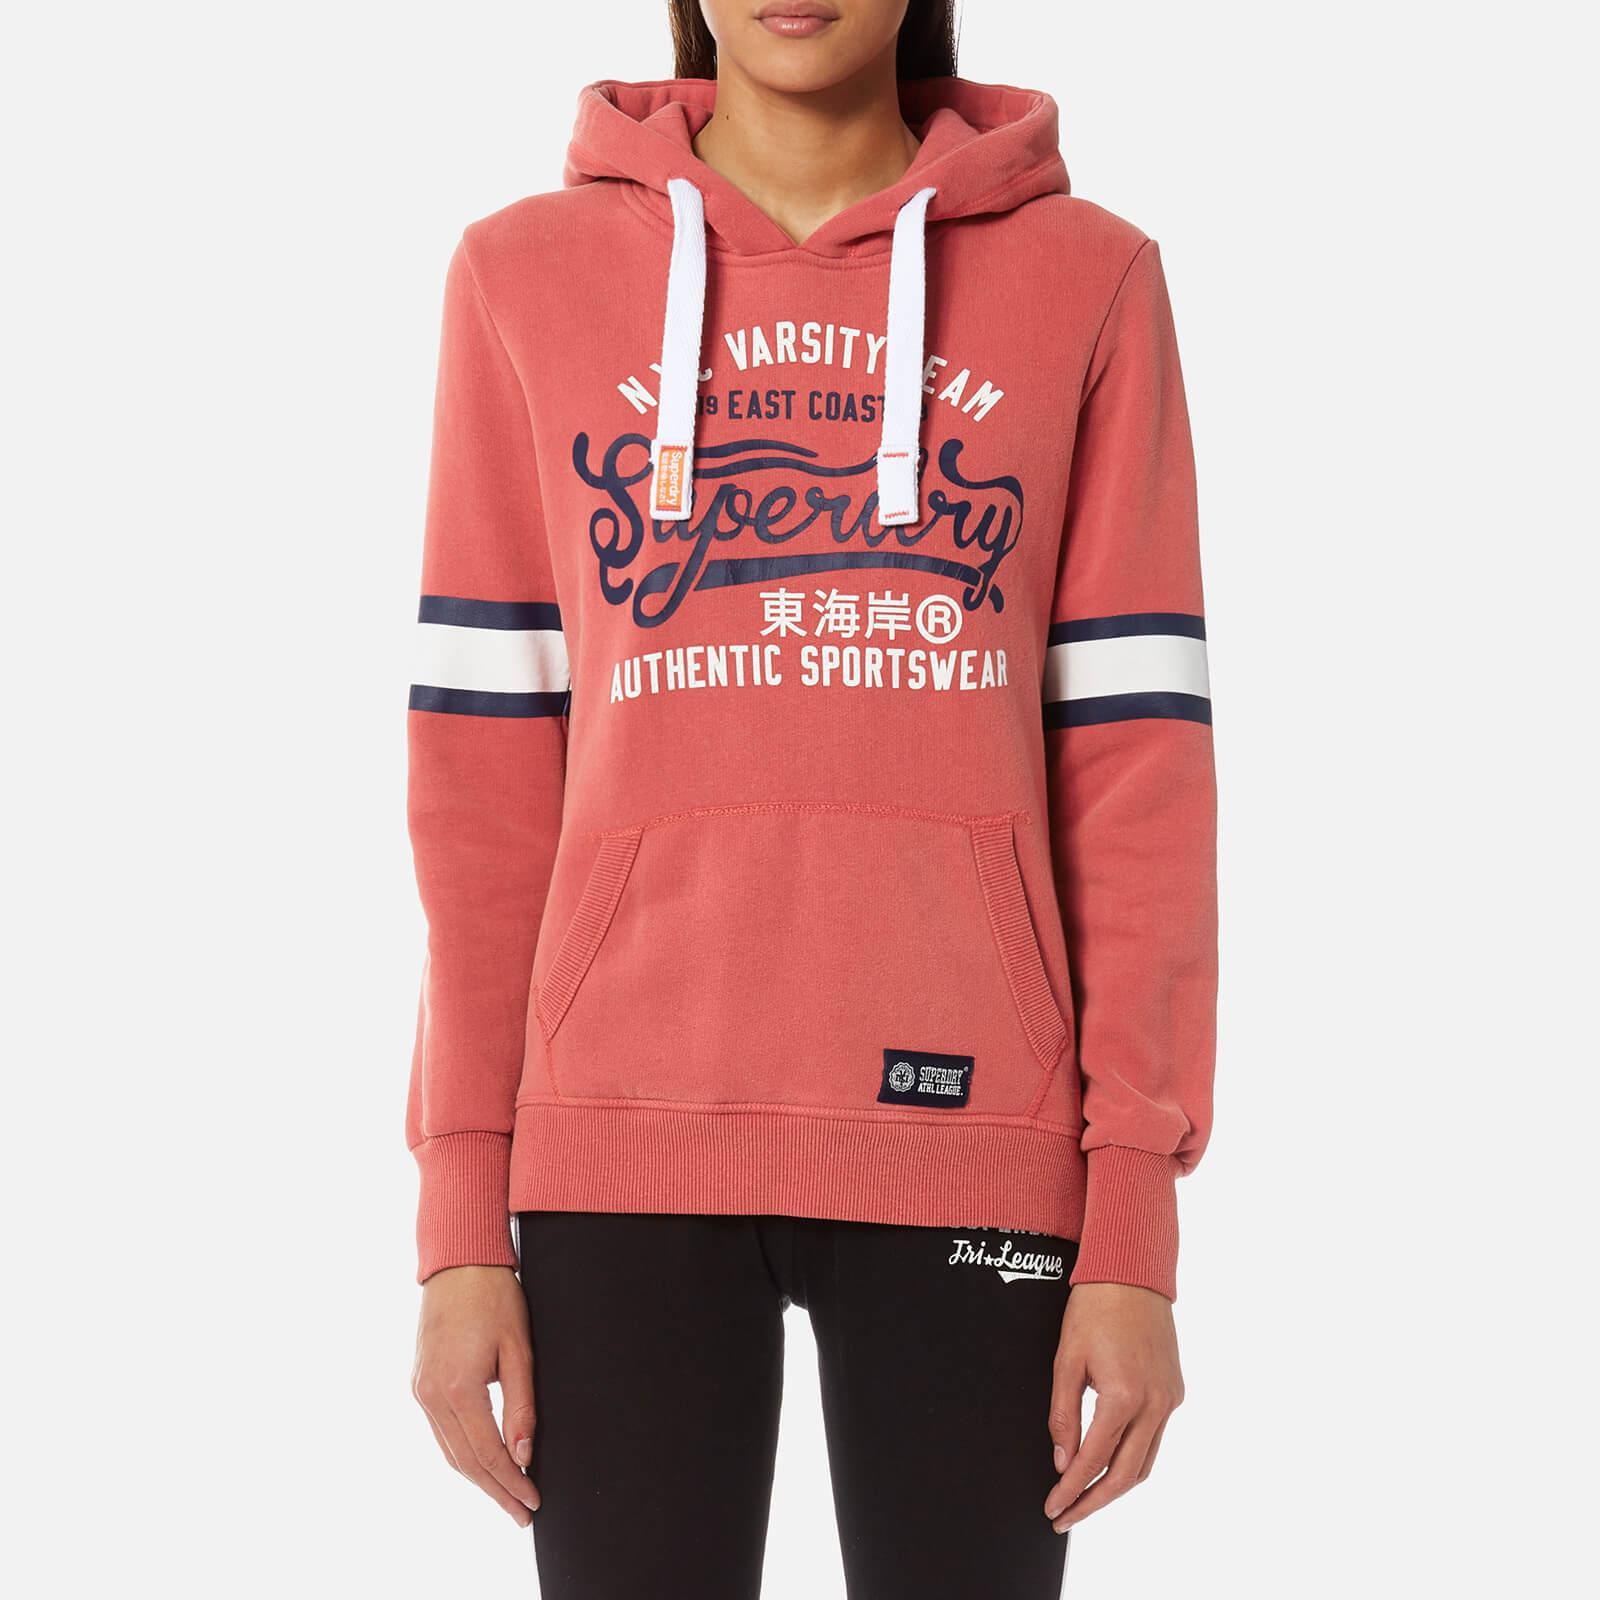 Superdry Varsity Team Entry Hooded Sweatshirt in Red - Lyst 4a4878362358